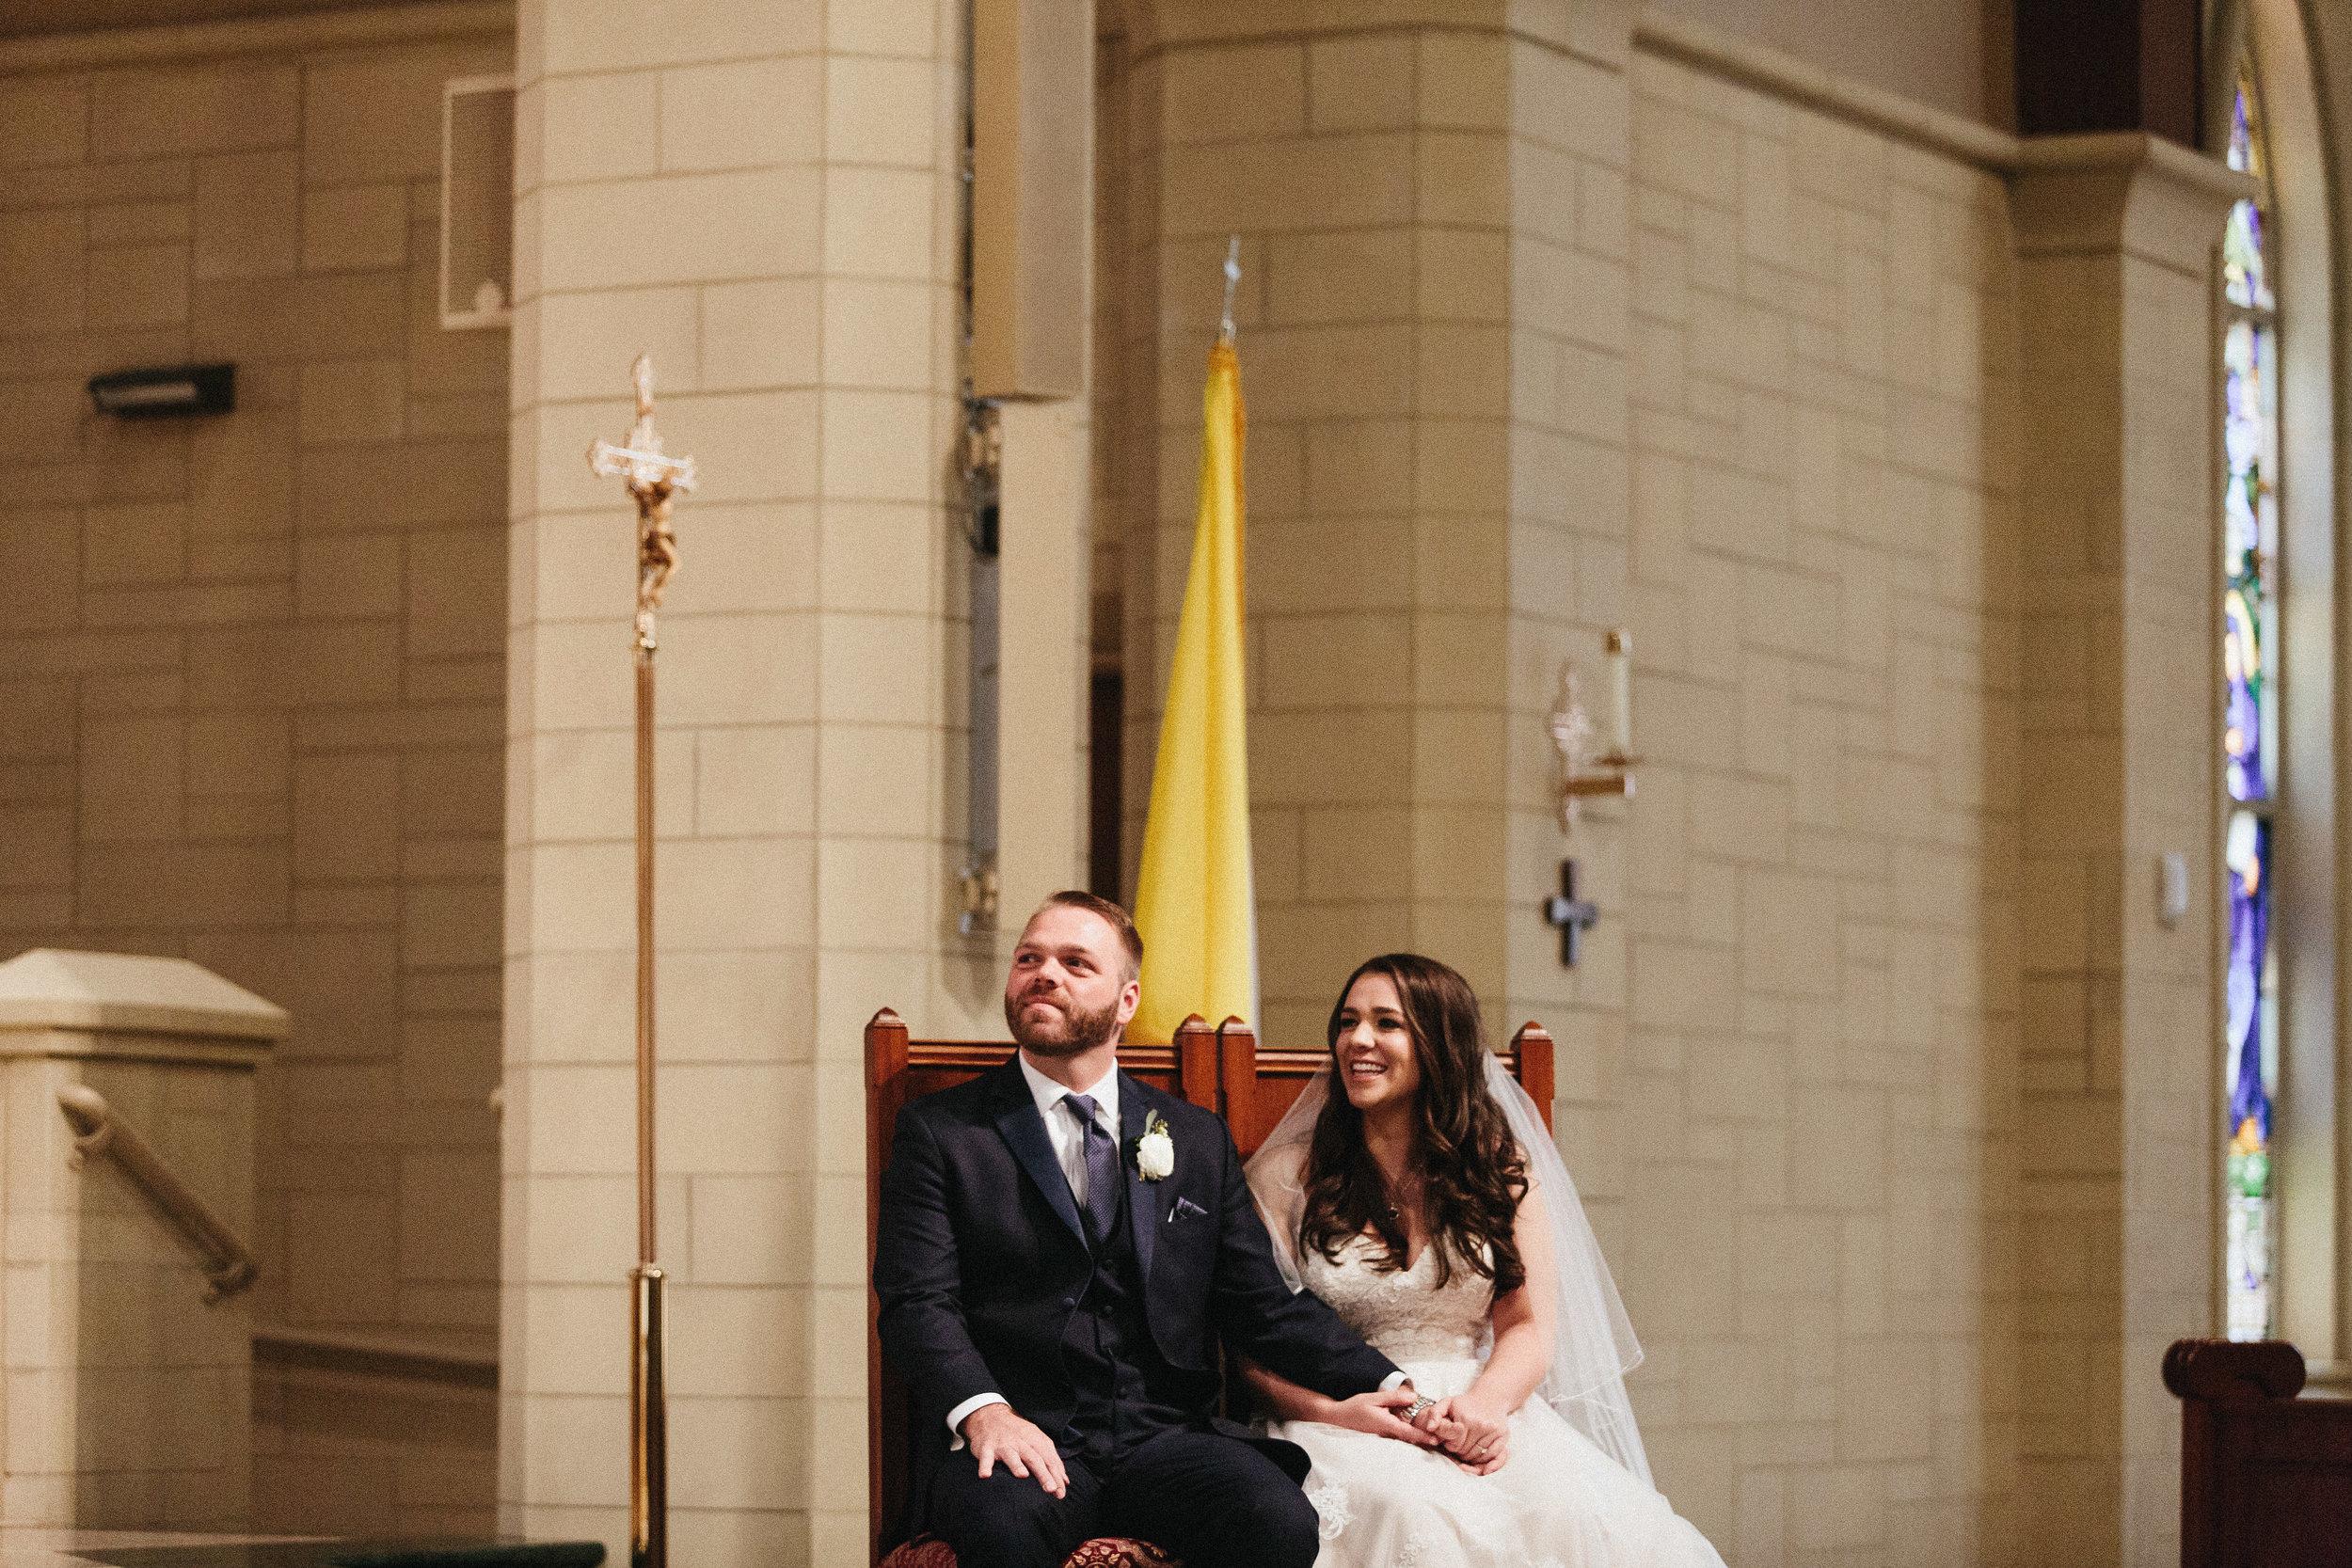 roswell_st_peter_chanel_catholic_avalon_hotel_alpharetta_wedding-1501.jpg